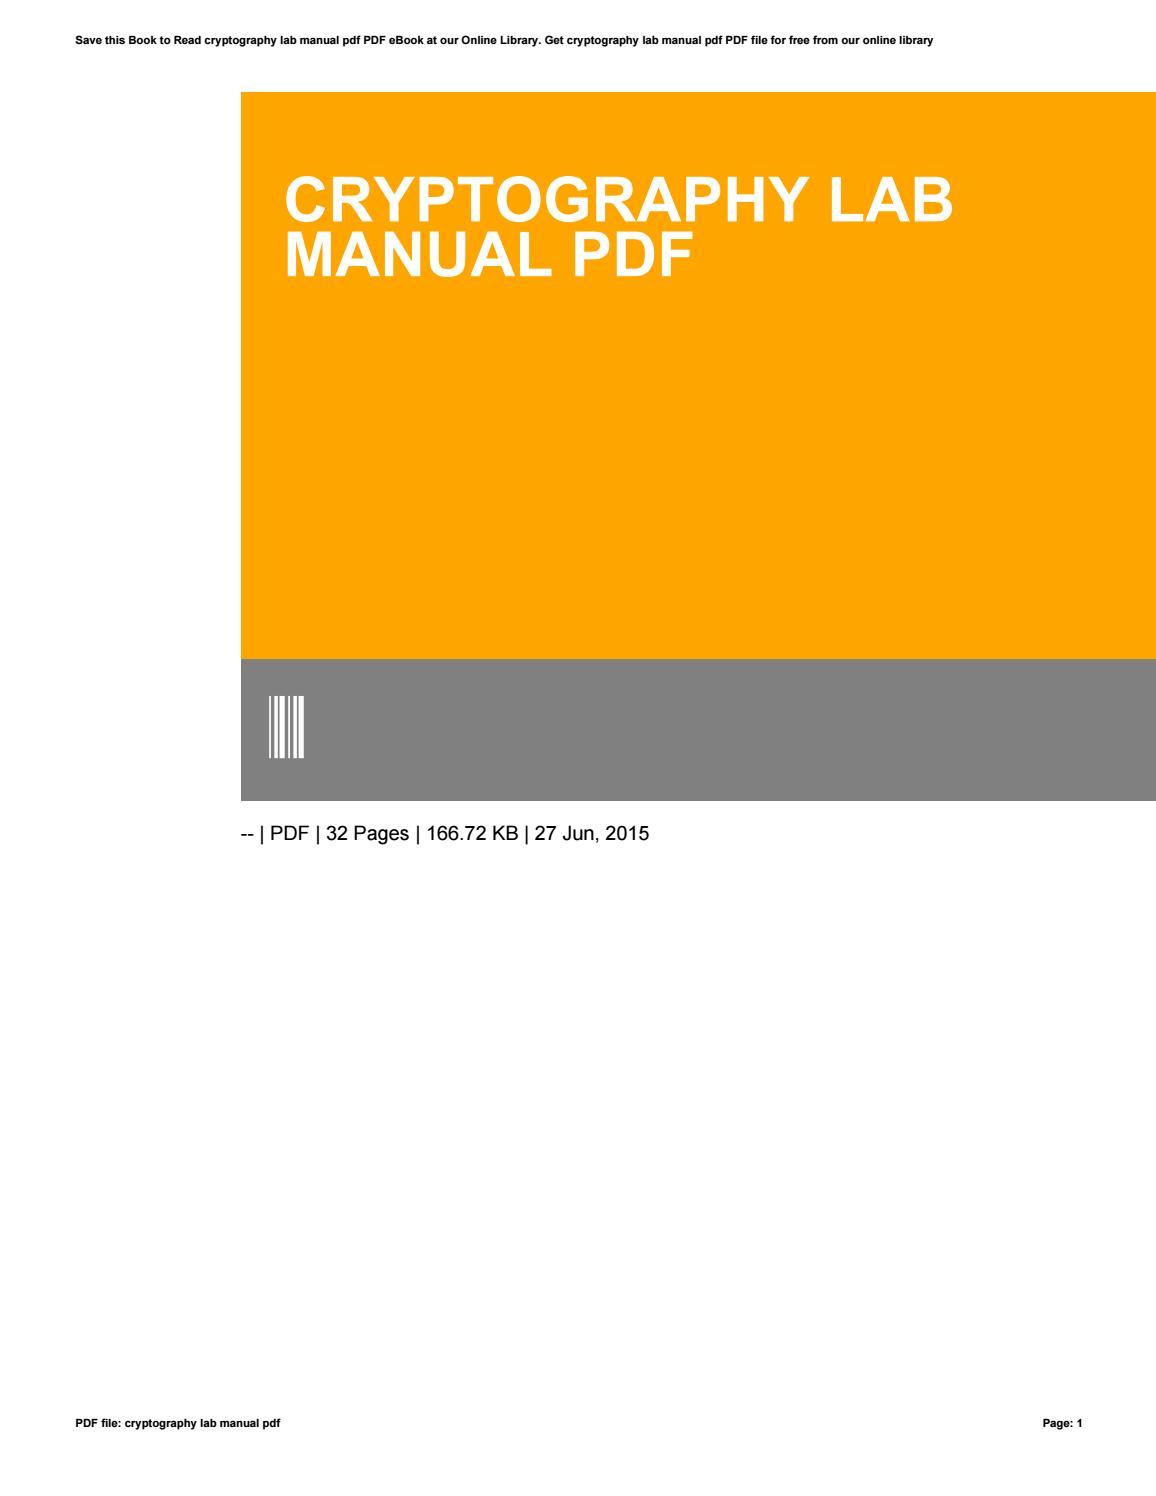 Cryptography lab manual pdf by ty251 - issuu